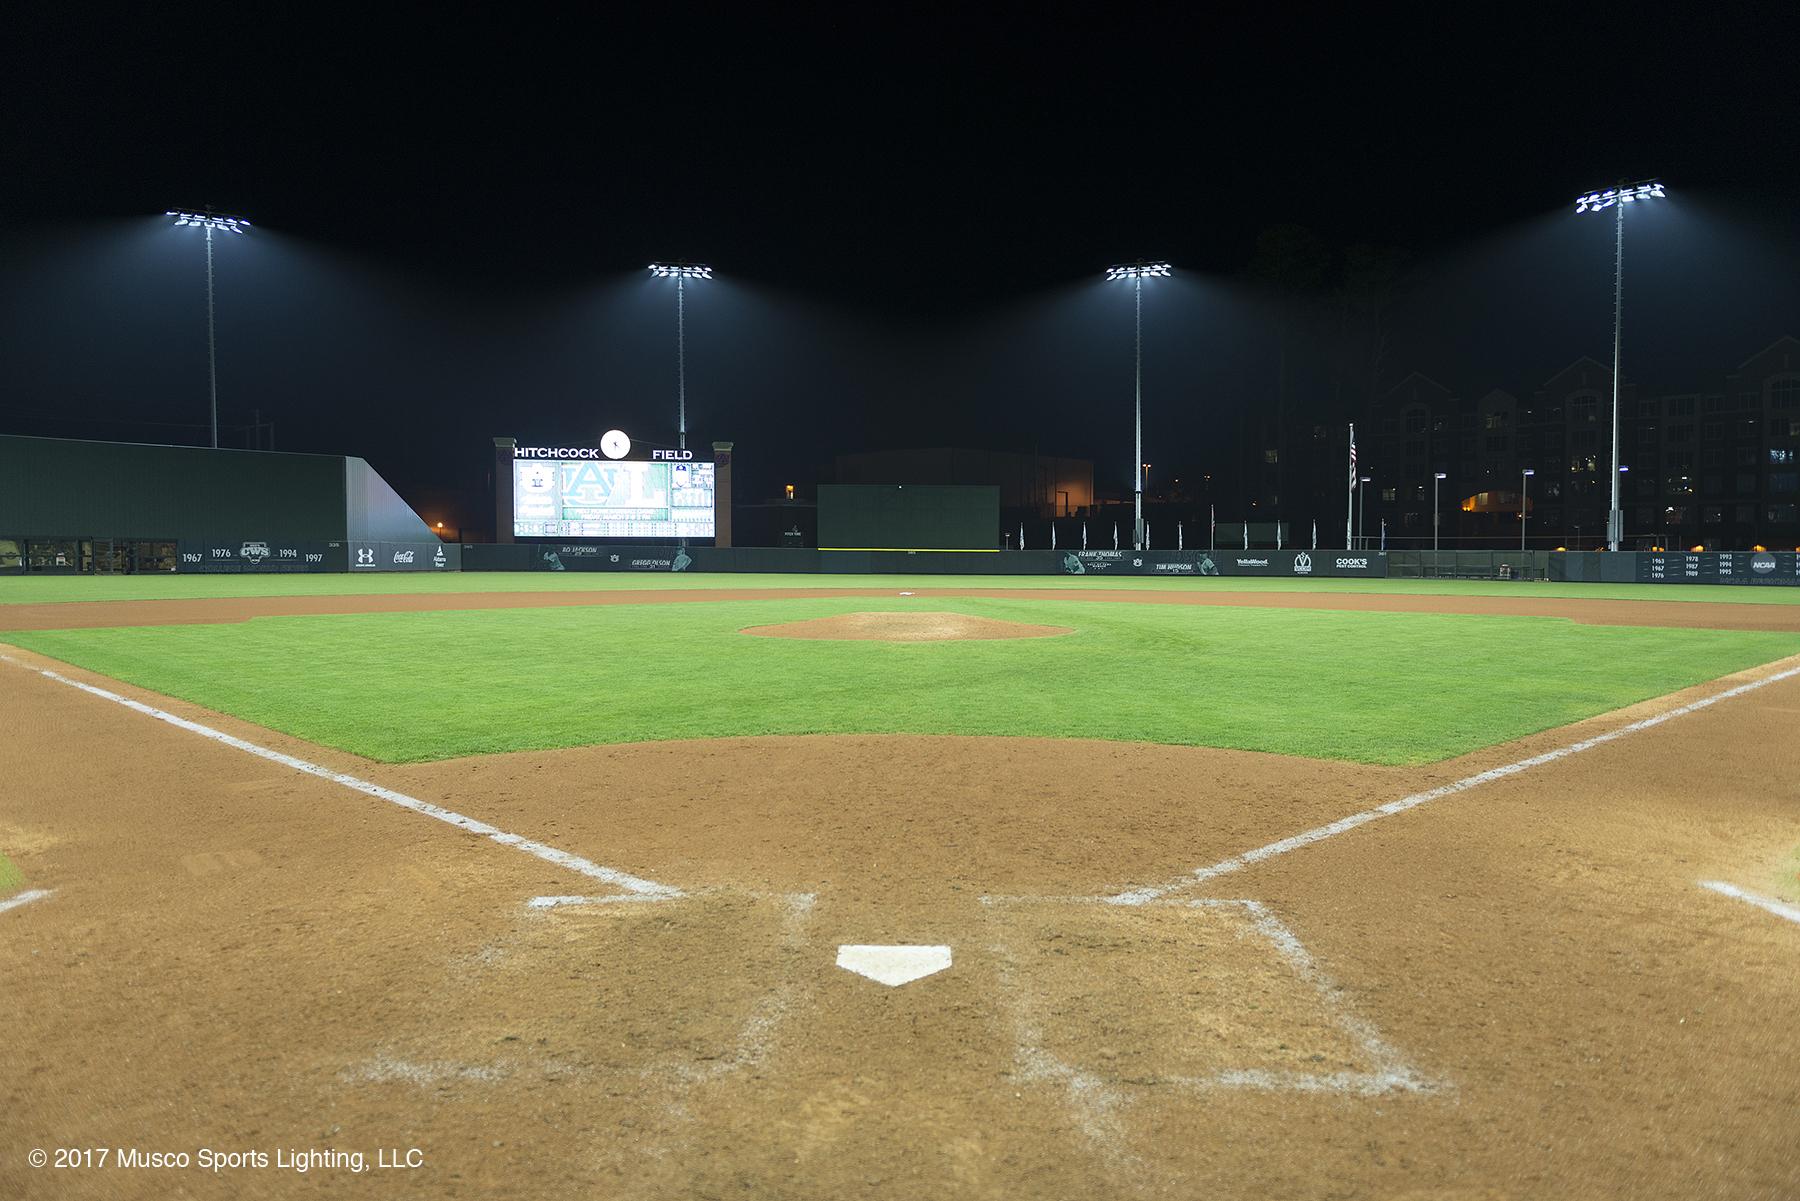 Custom optics developed around the LED light source reduce glare to improve visibility for players. (Photo: Musco Lighting)